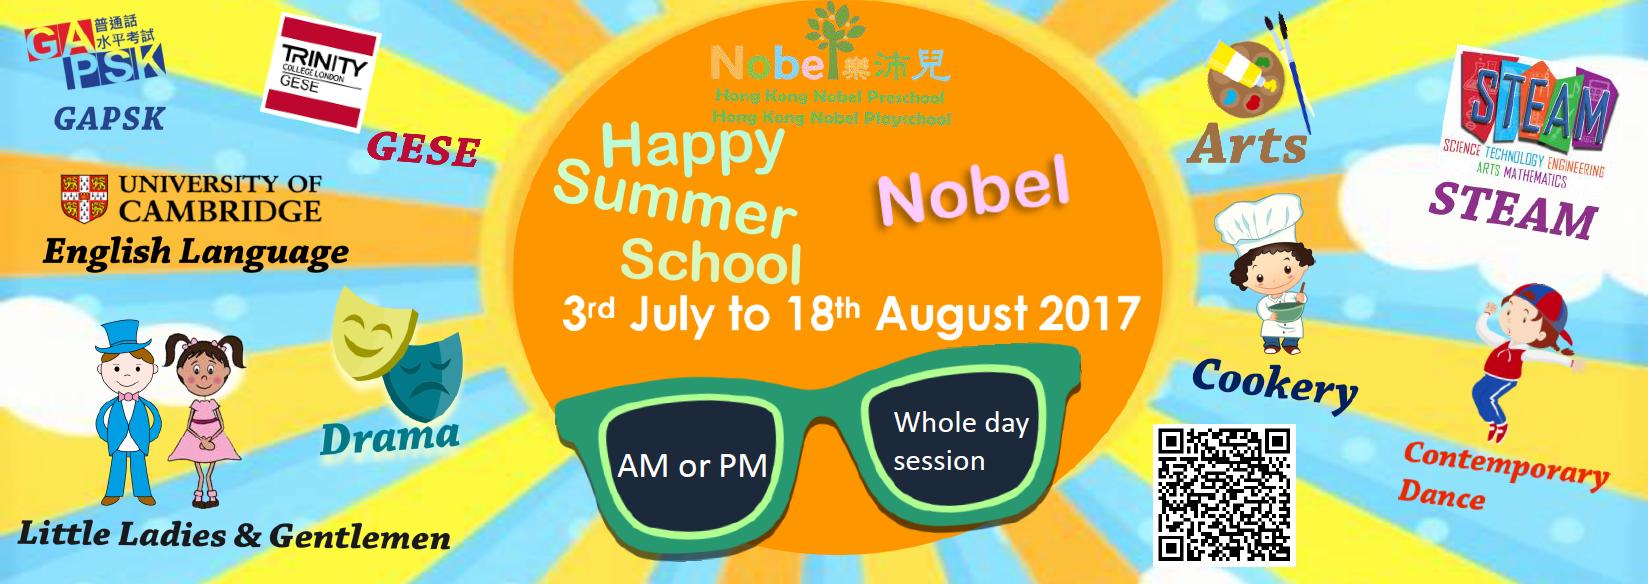 2016-2017 summer school banner